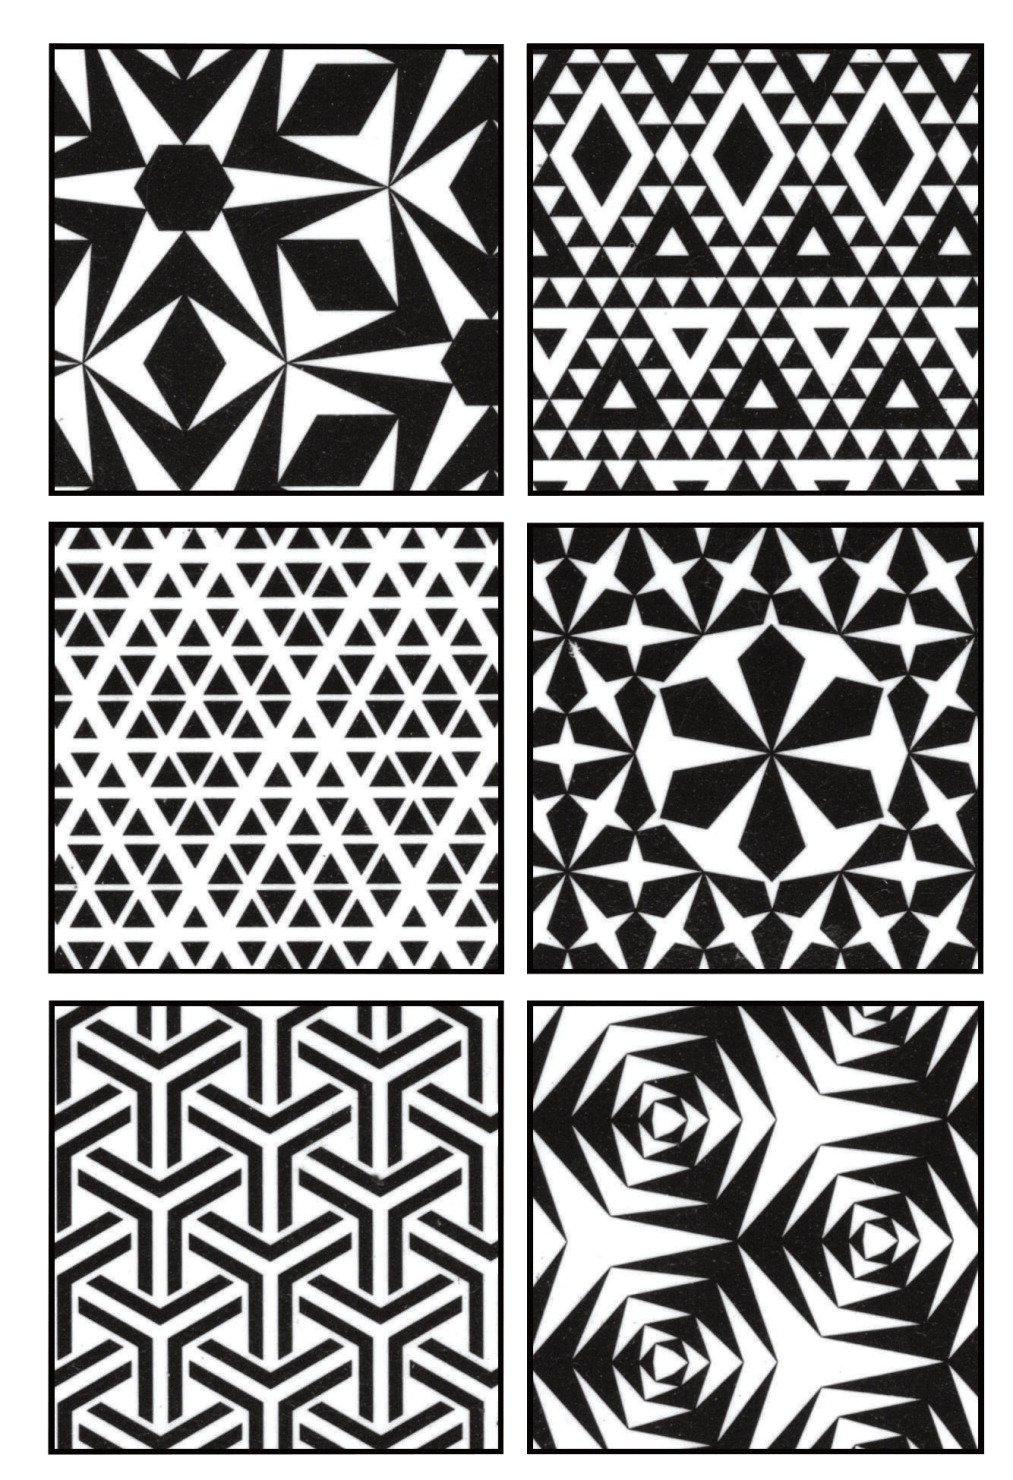 Cedar Canyon Textiles Artist's Paintstiks Rubbing Plates, Triangles, 6-Pack by Cedar Canyon Textiles